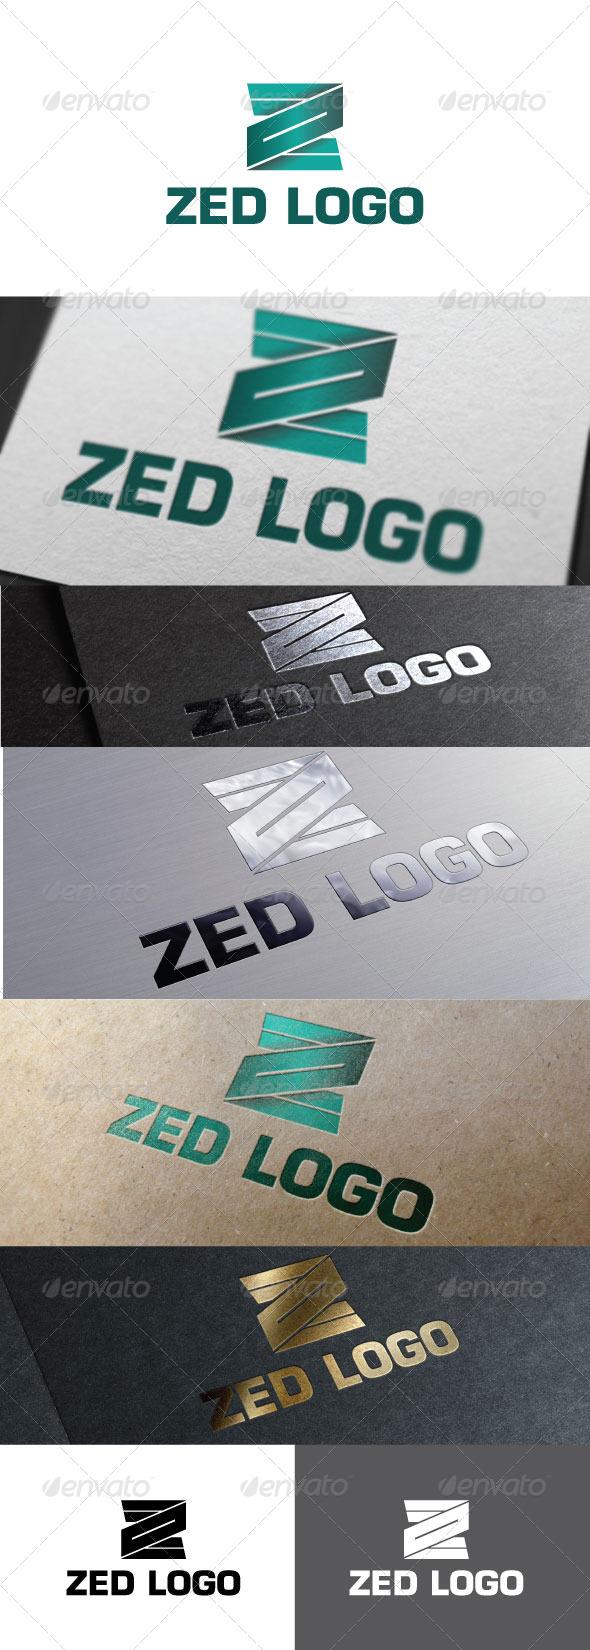 GraphicRiver Zed Logo Template 6656841